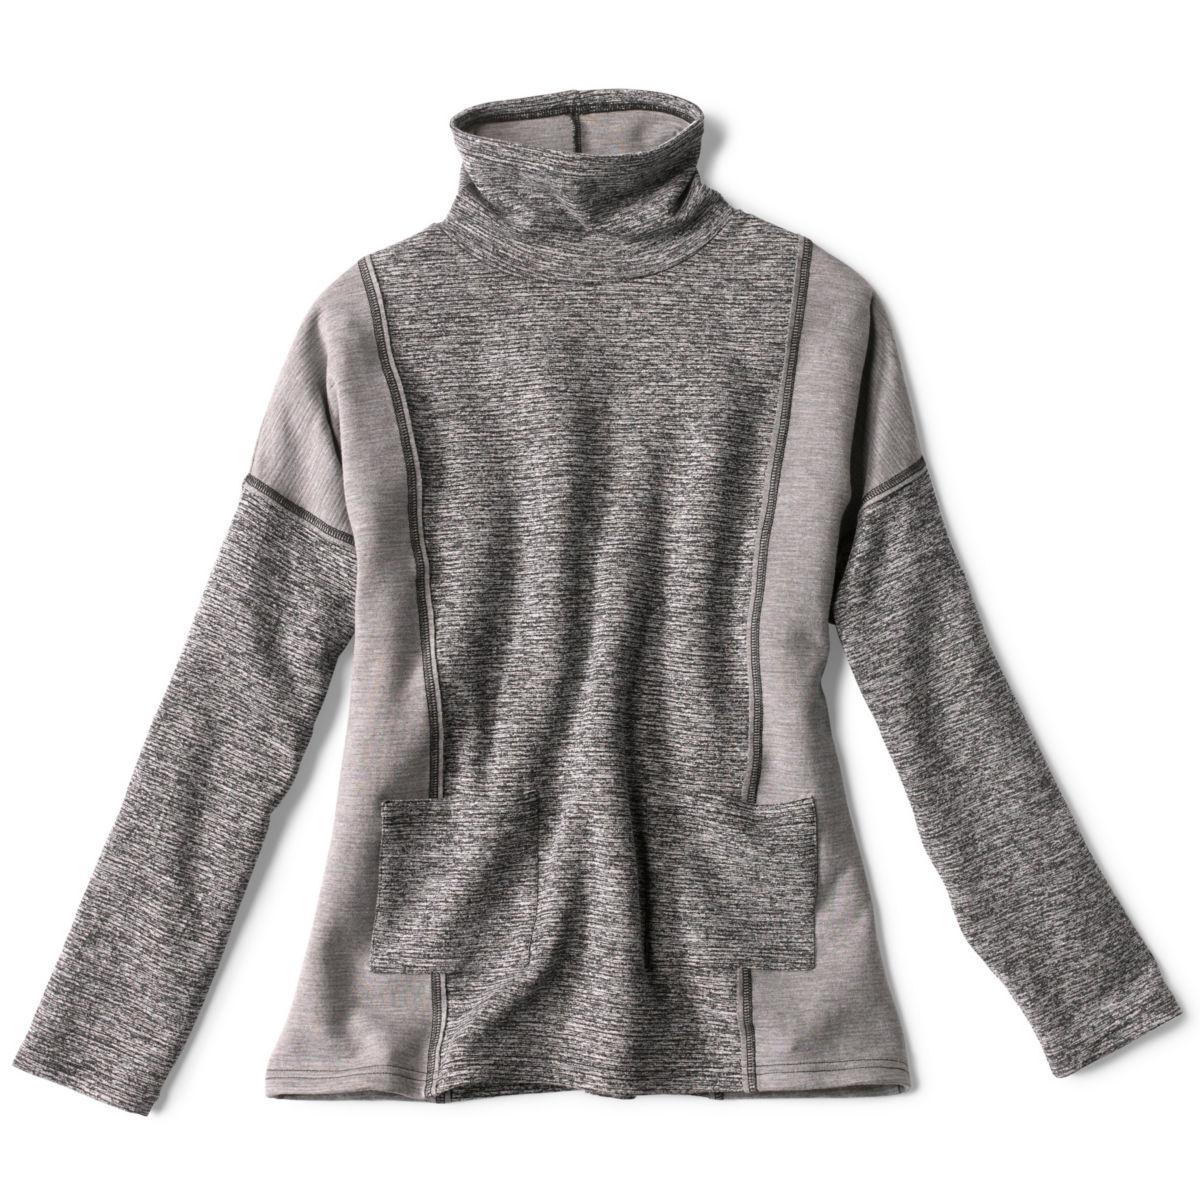 Mixed-Knit Mockneck Sweatshirt - HEATHERED GRAYimage number 0